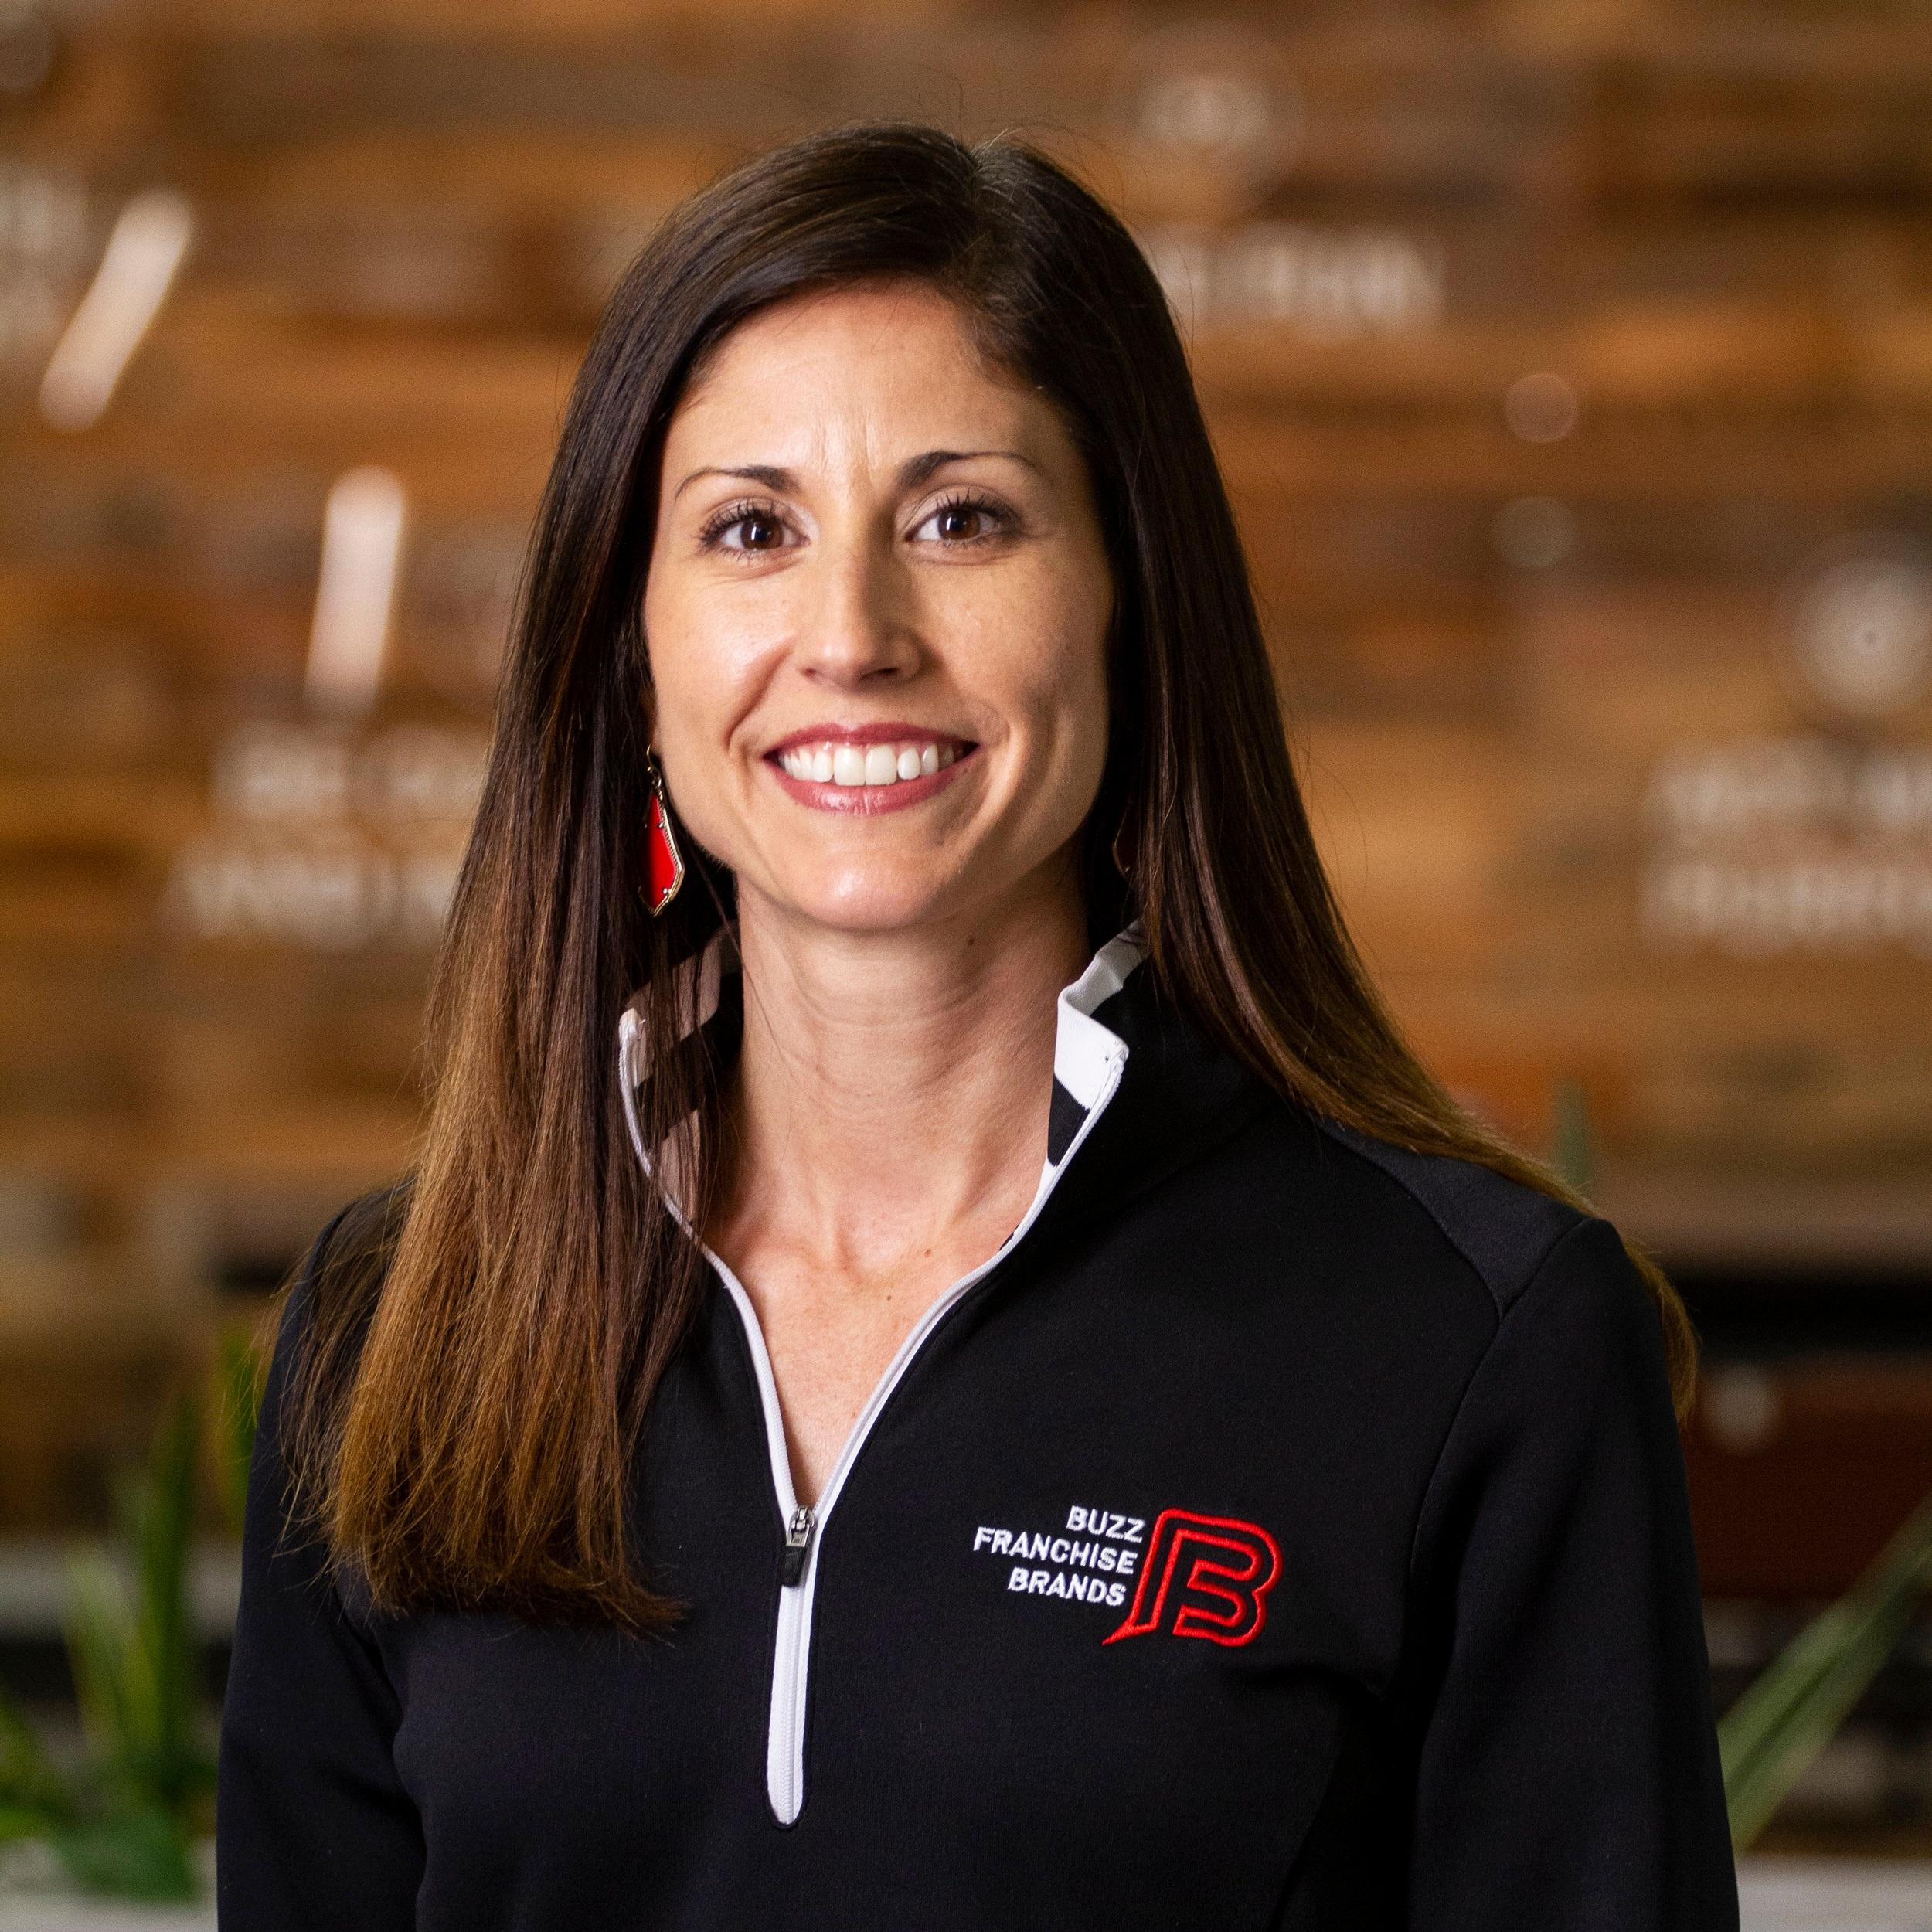 Angela Paules, CMO